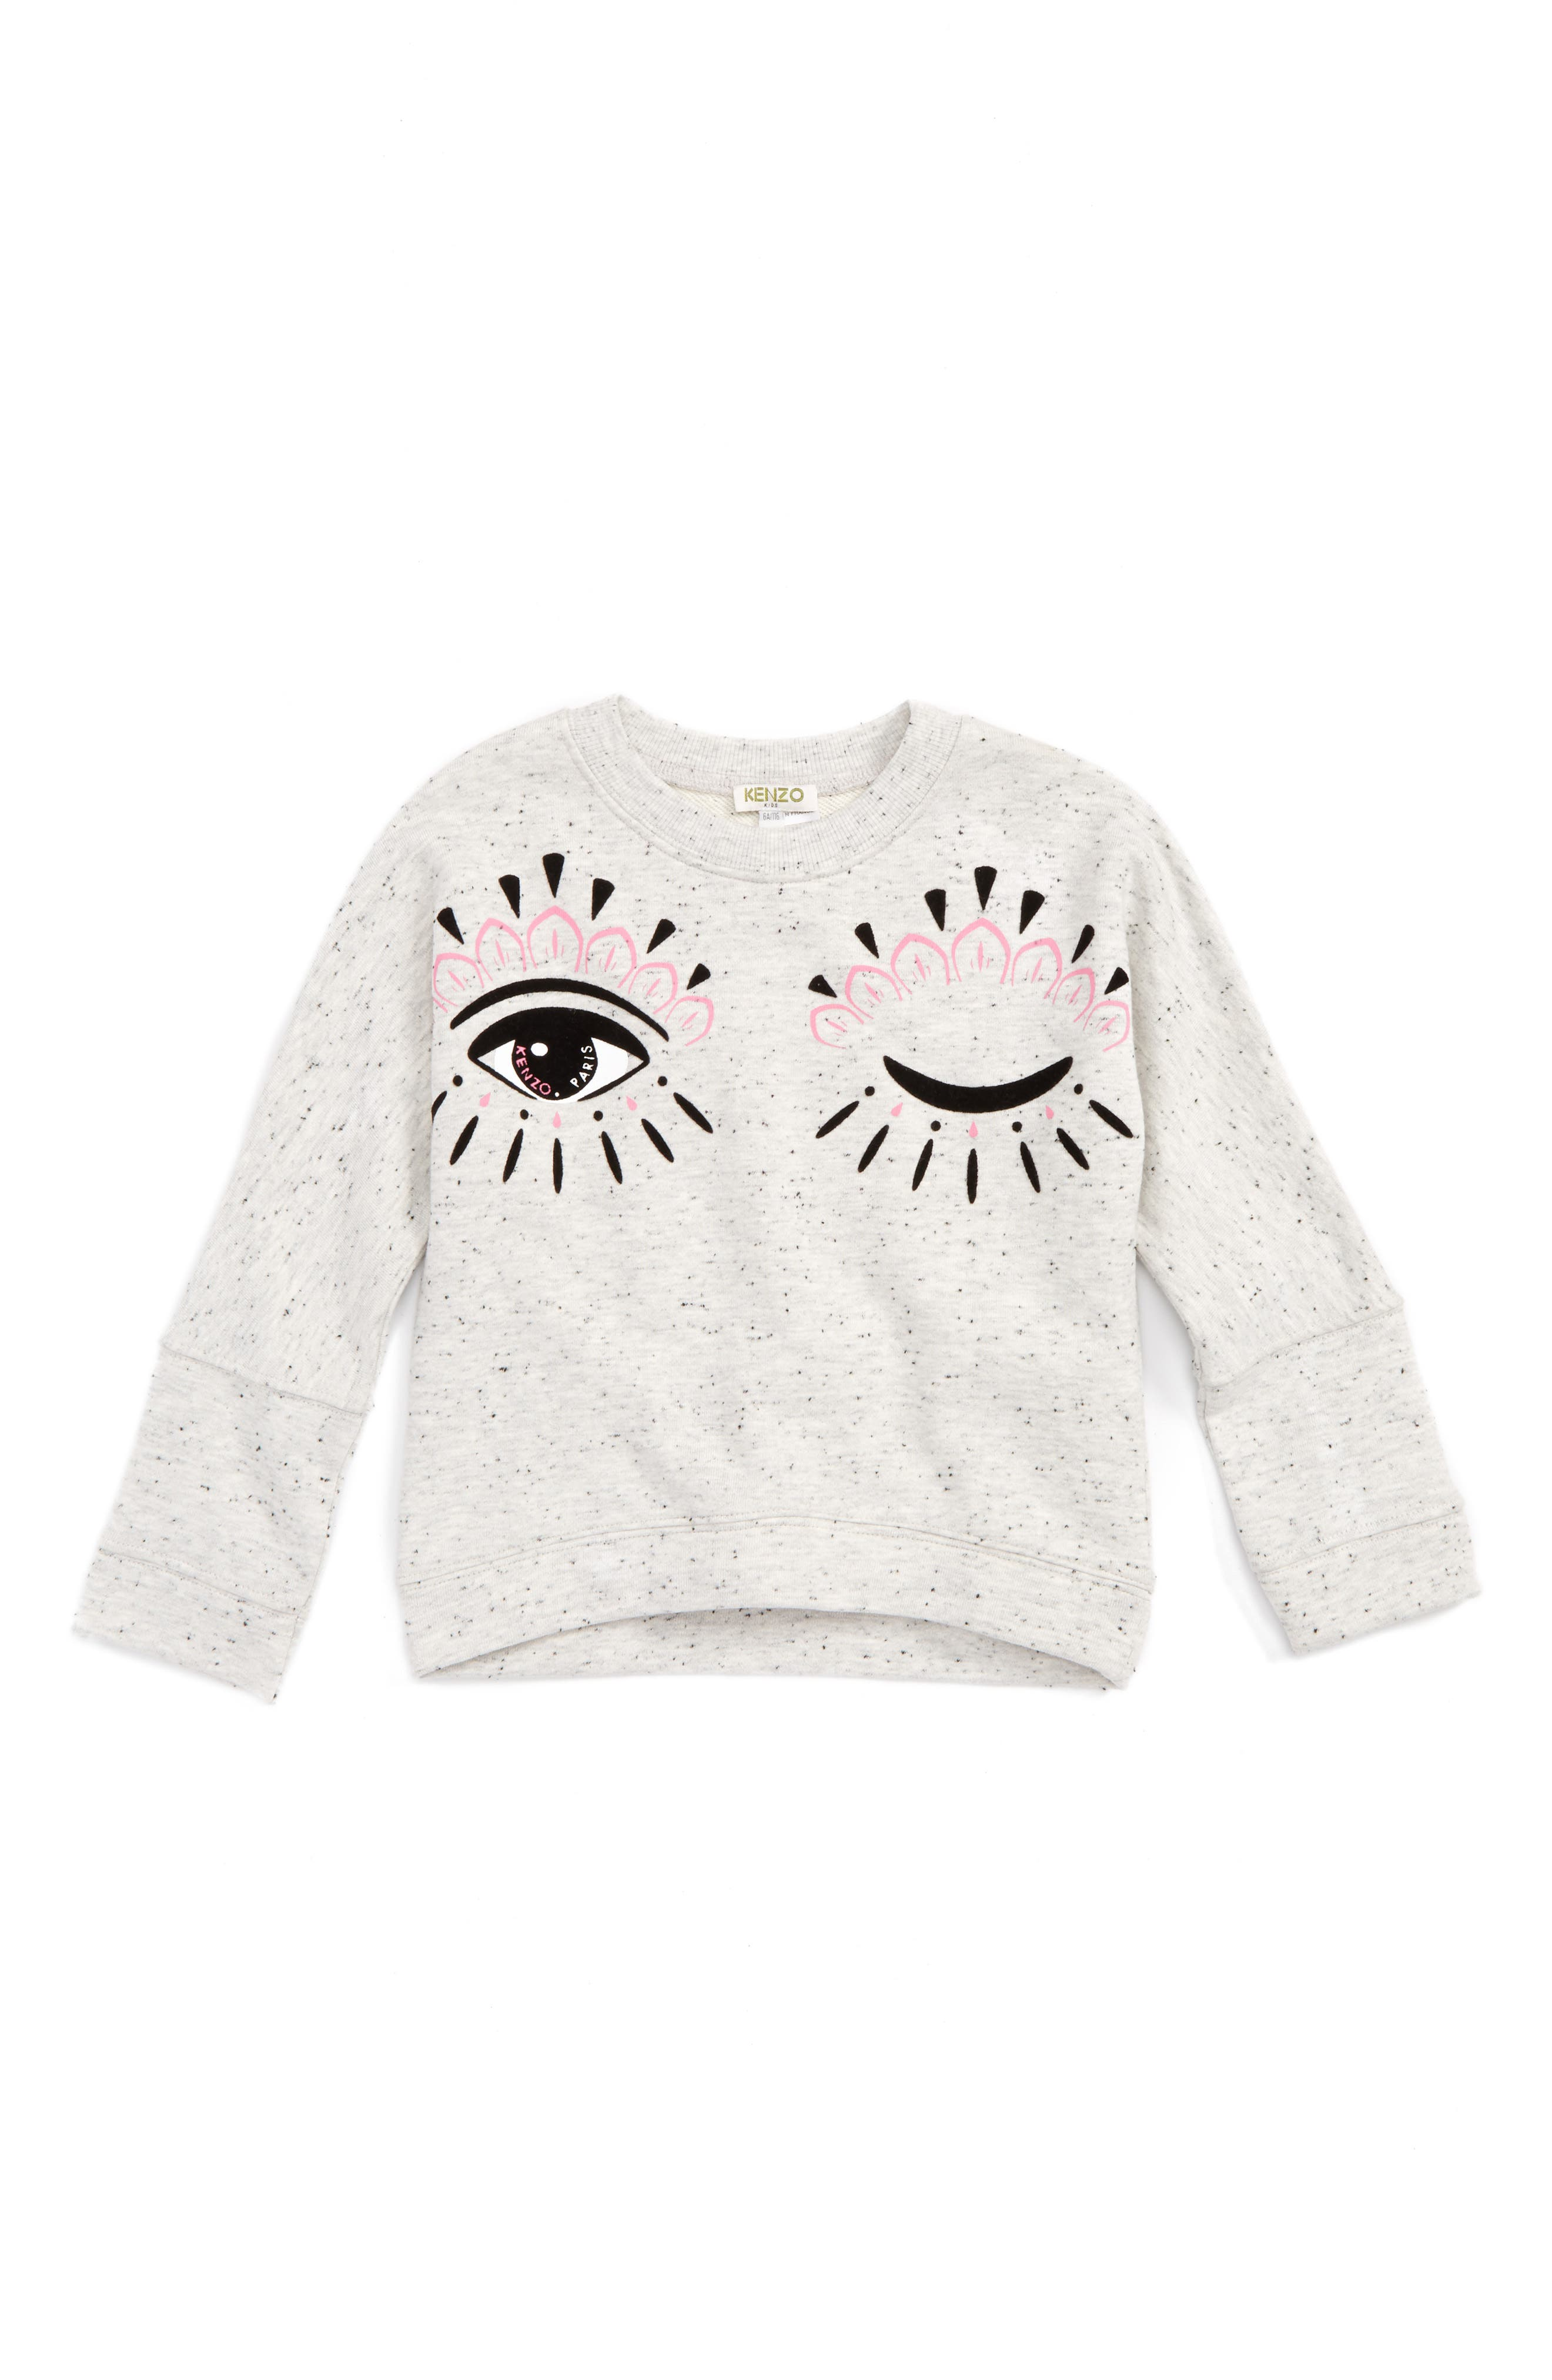 Blinking Eye Sweatshirt,                         Main,                         color, 030